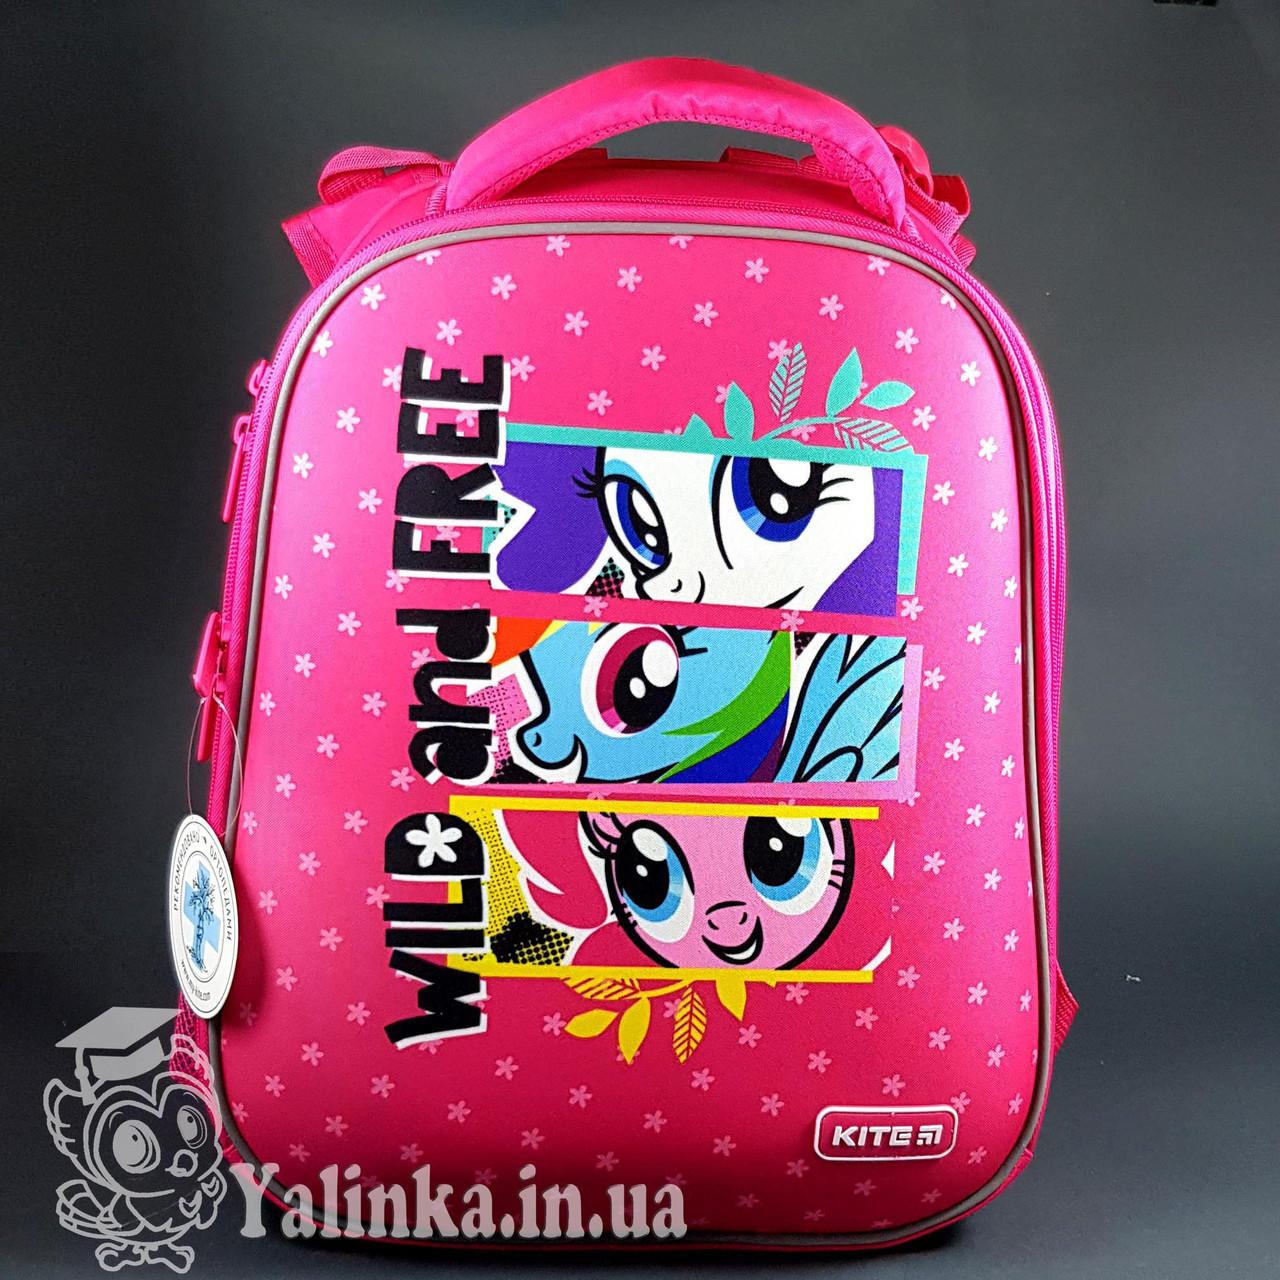 6c0ba6ba36c4 Рюкзак Школьный Каркасный Kite Education My Little Pony LP19-531M ...